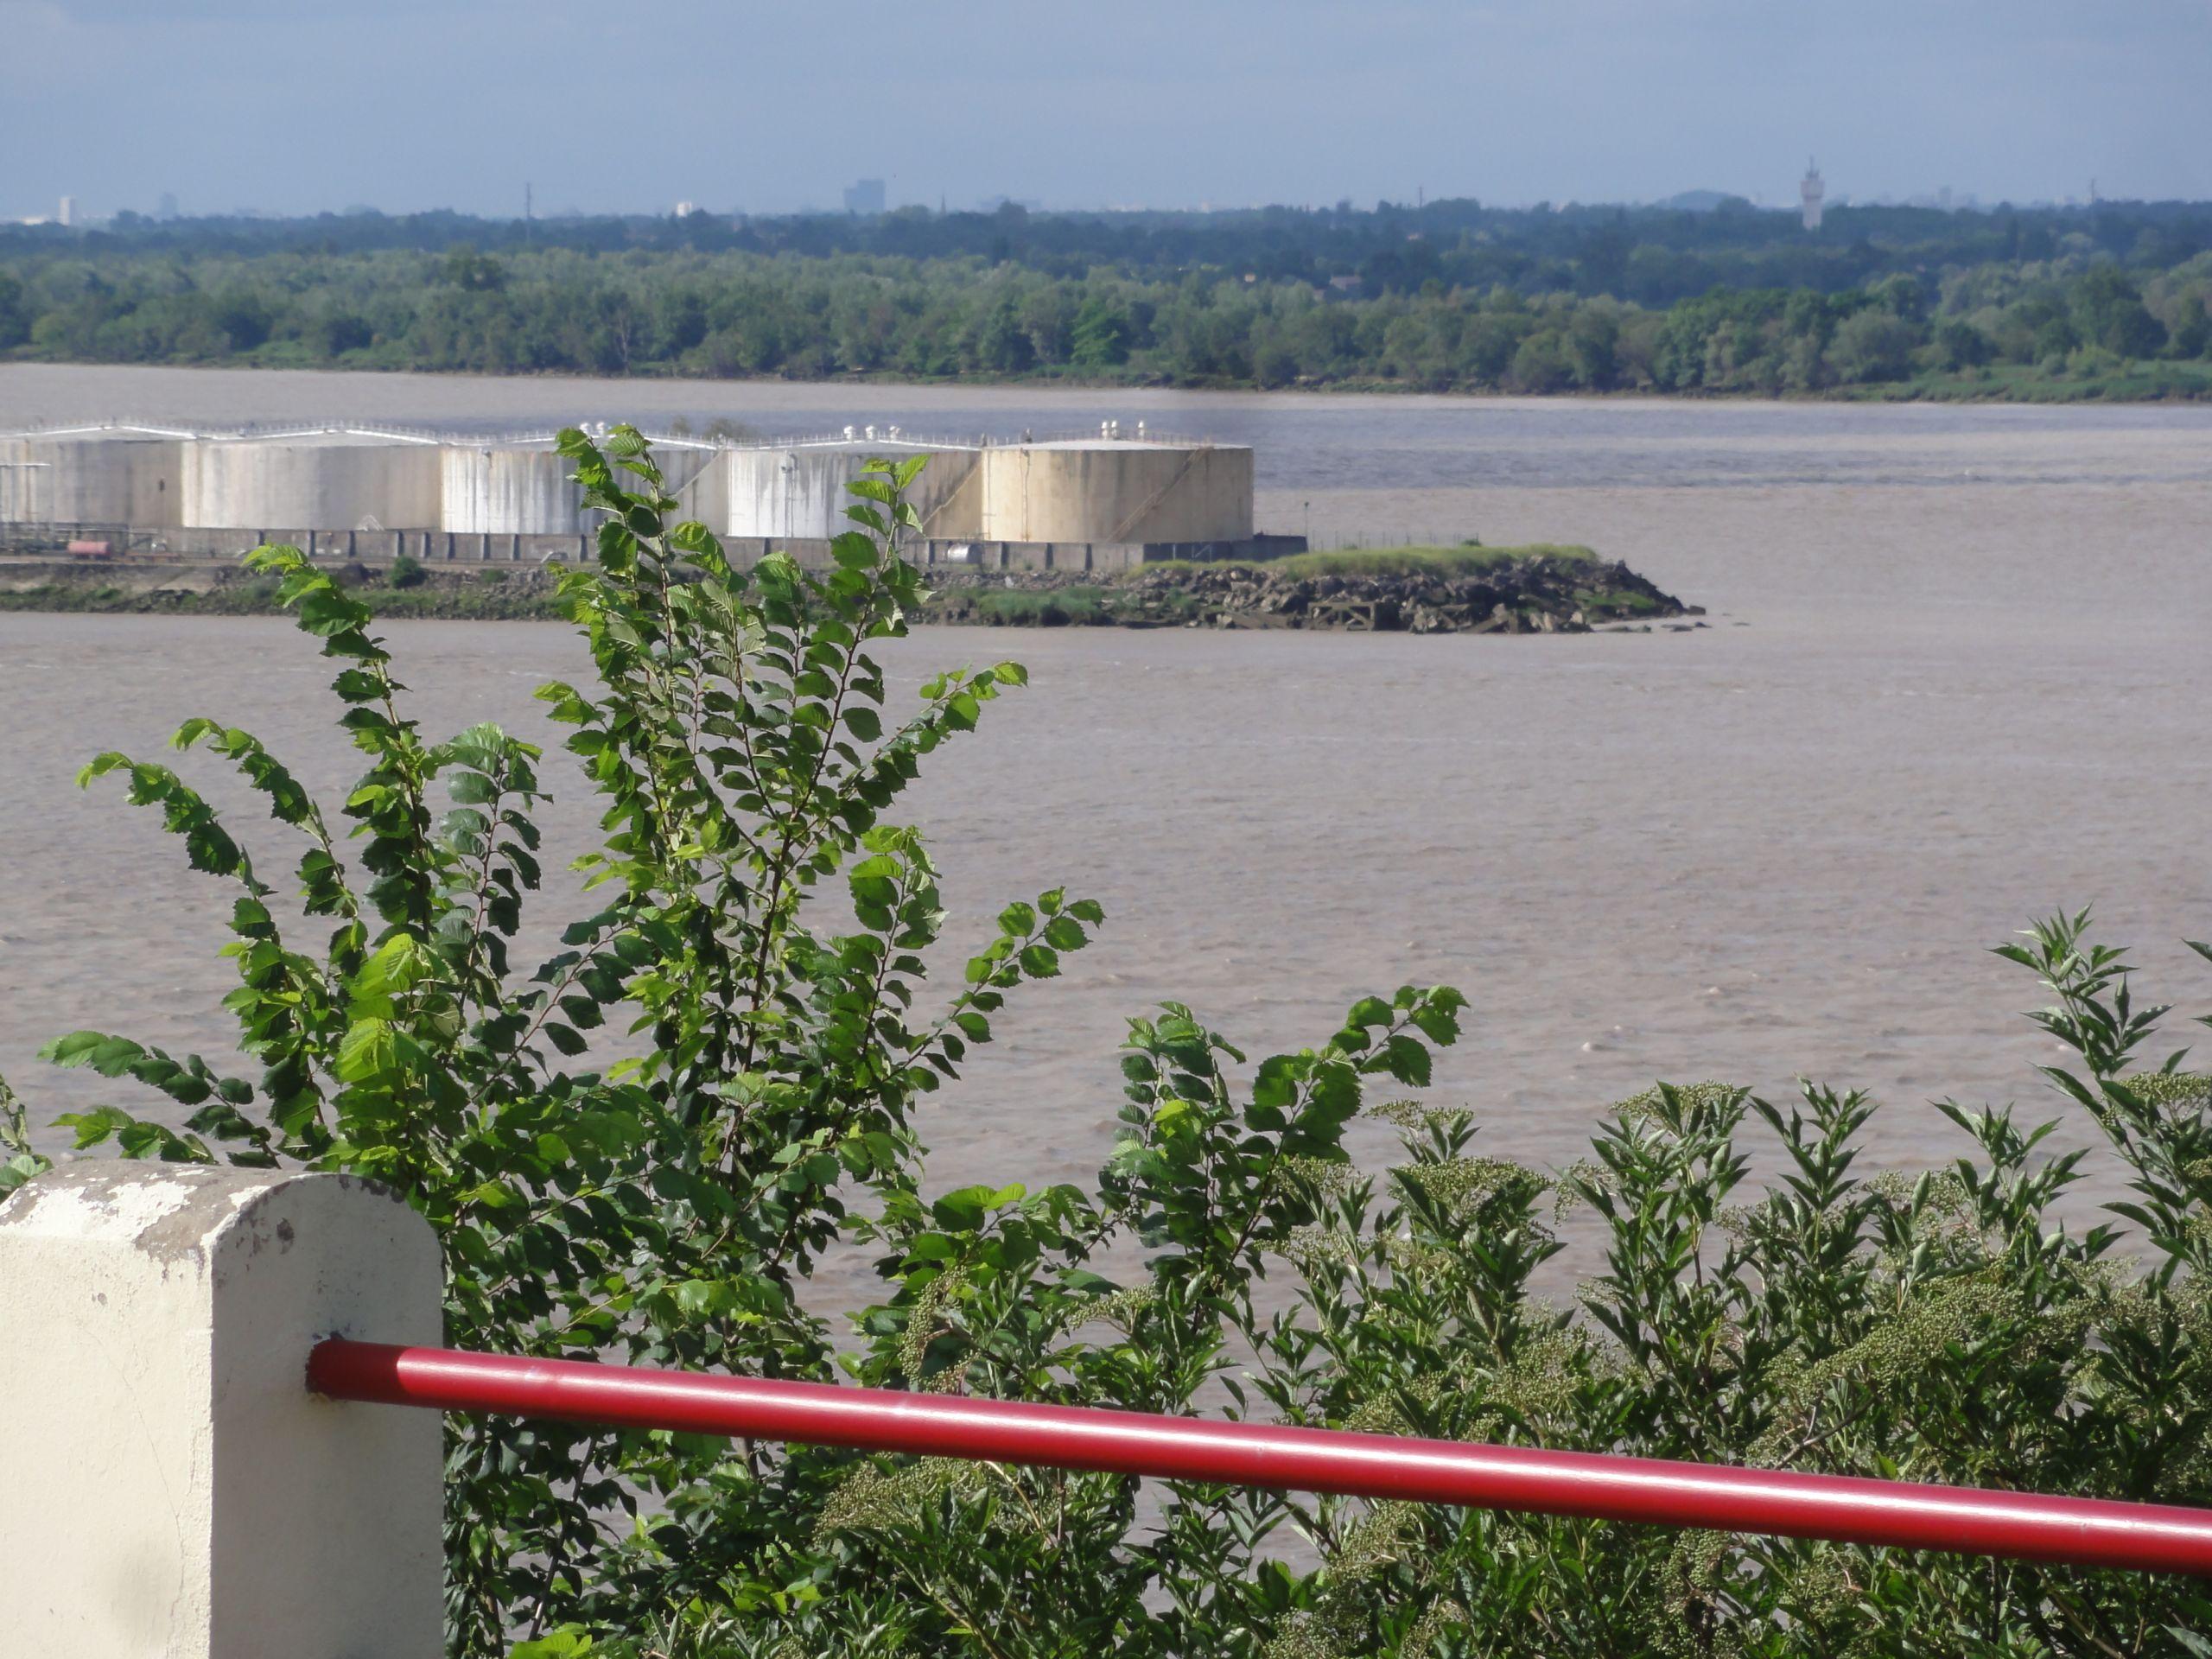 Bayon sur Gironde Gironde vue sur Bec d Ambès 02 JPG